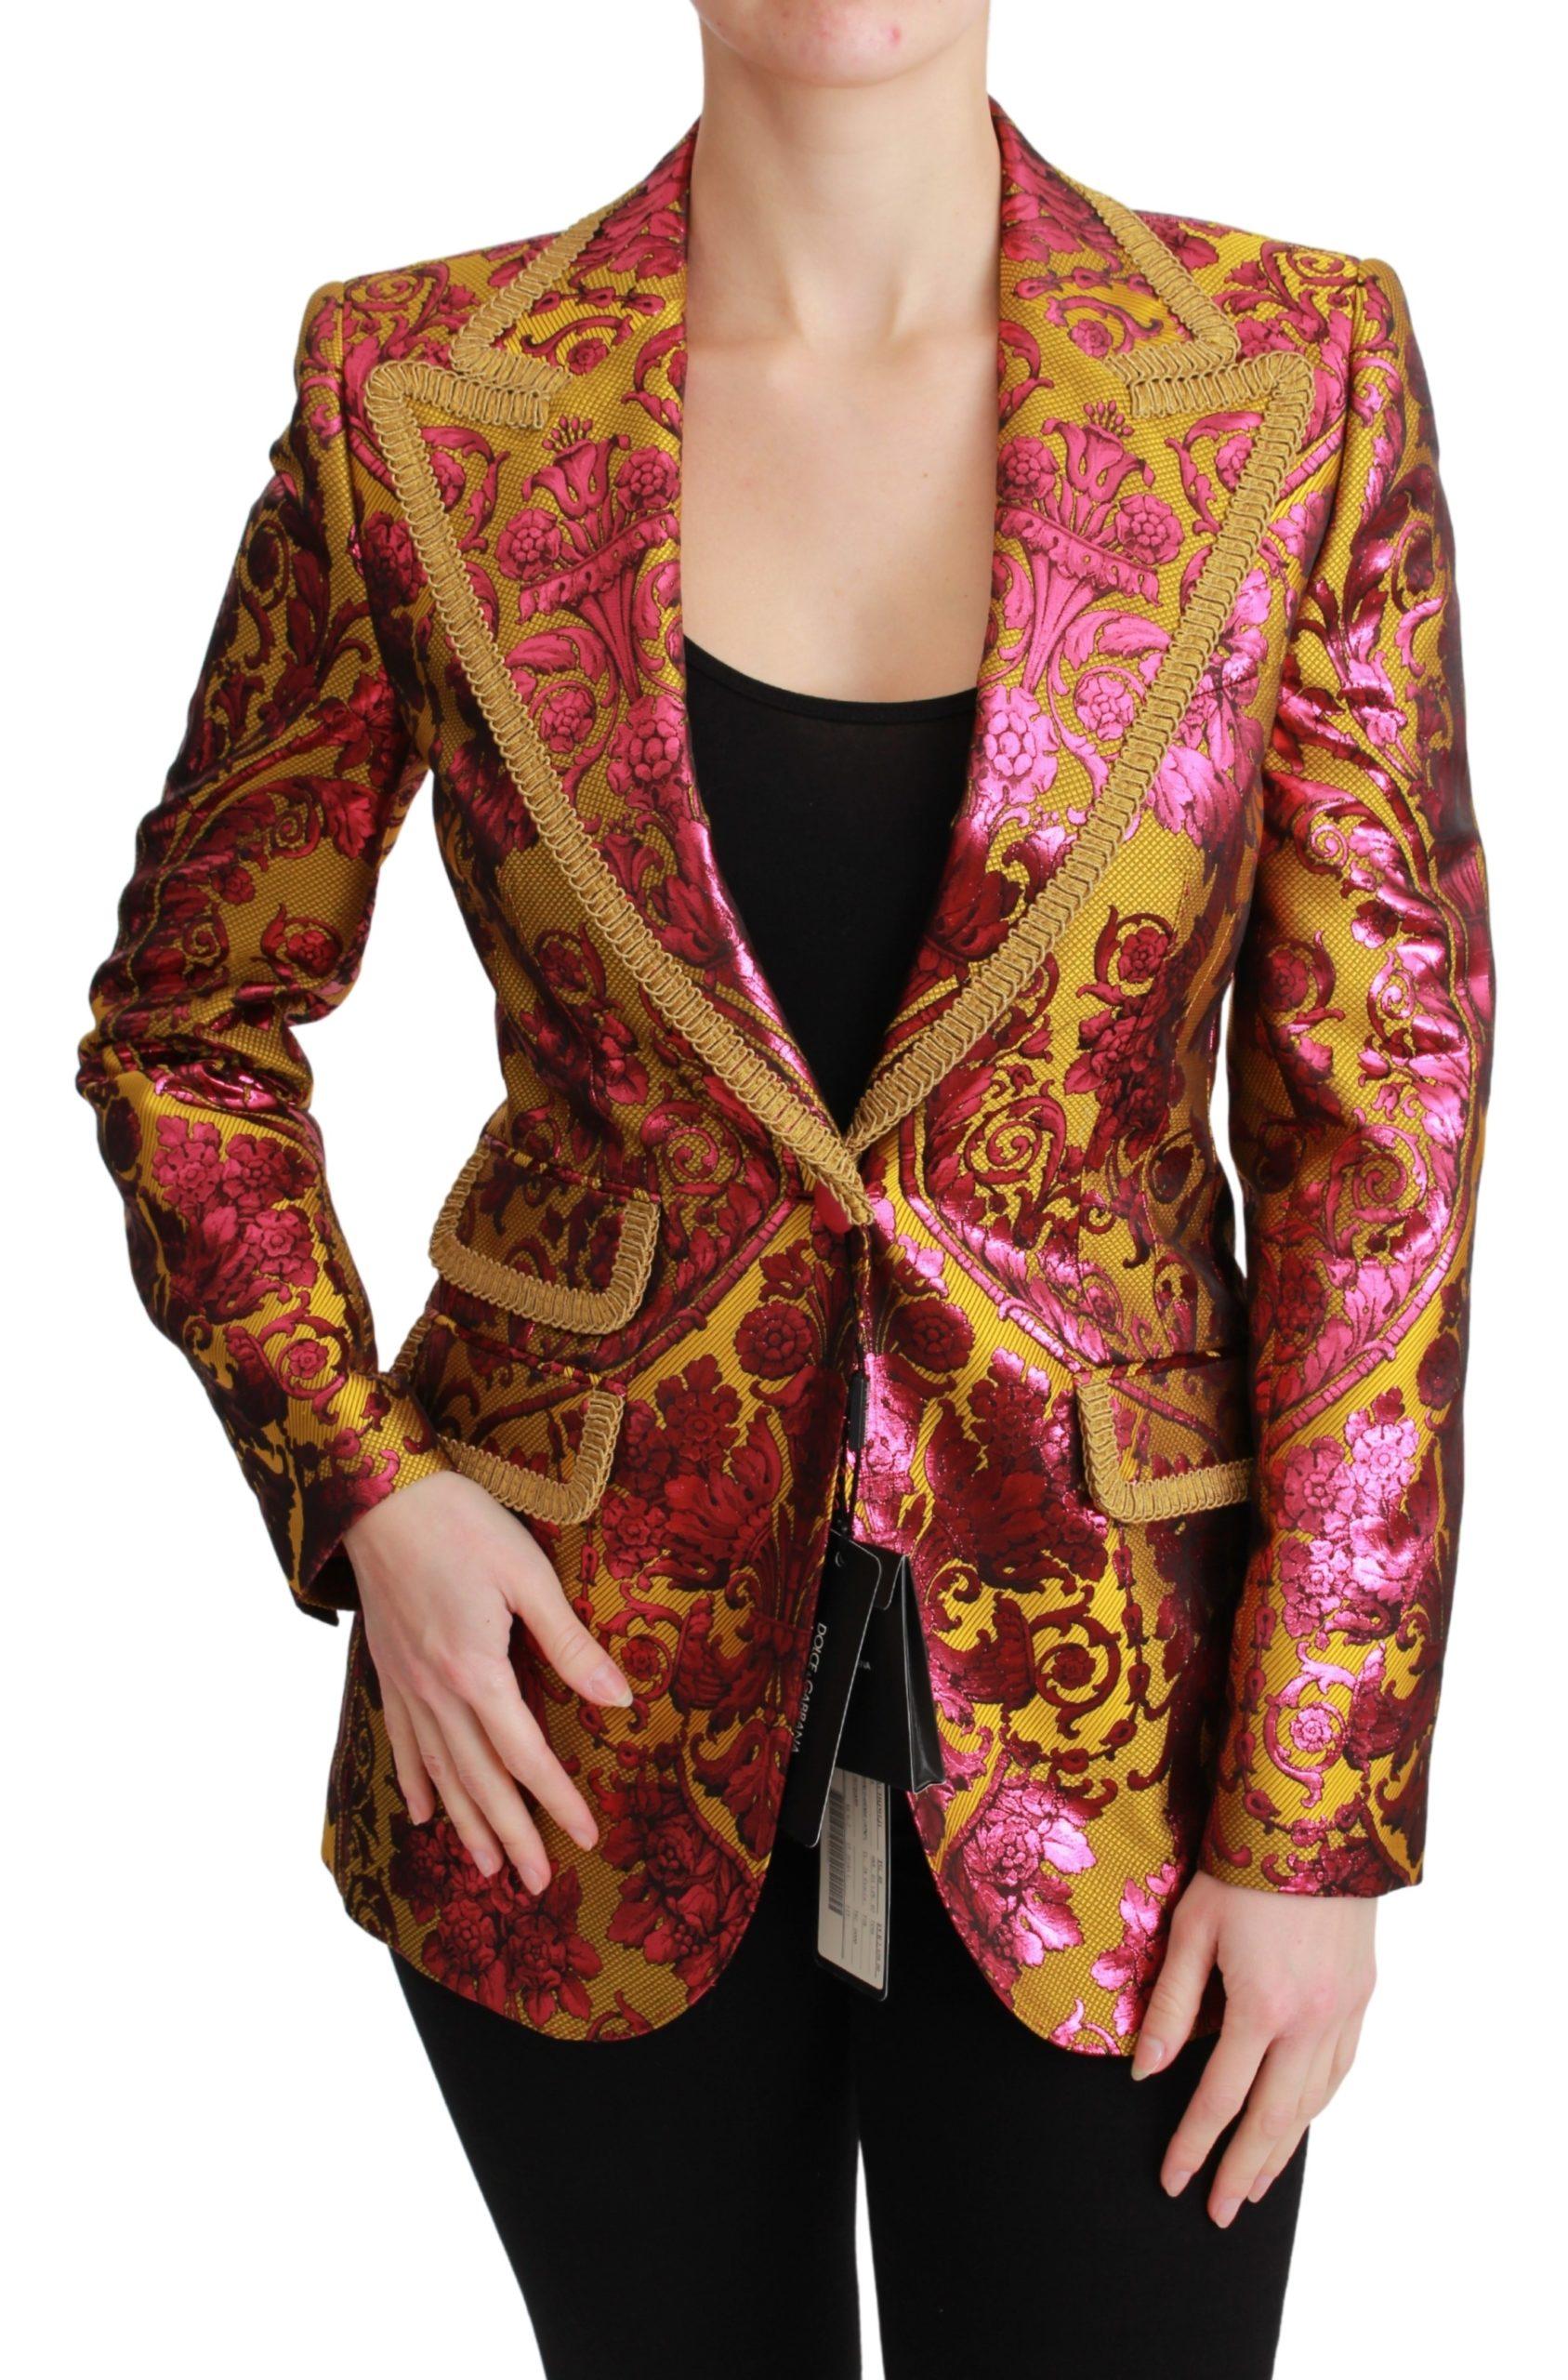 Dolce & Gabbana Women's Gold Jacquard Blazer Jacket Gold and Pink JKT2629 - IT36   XS